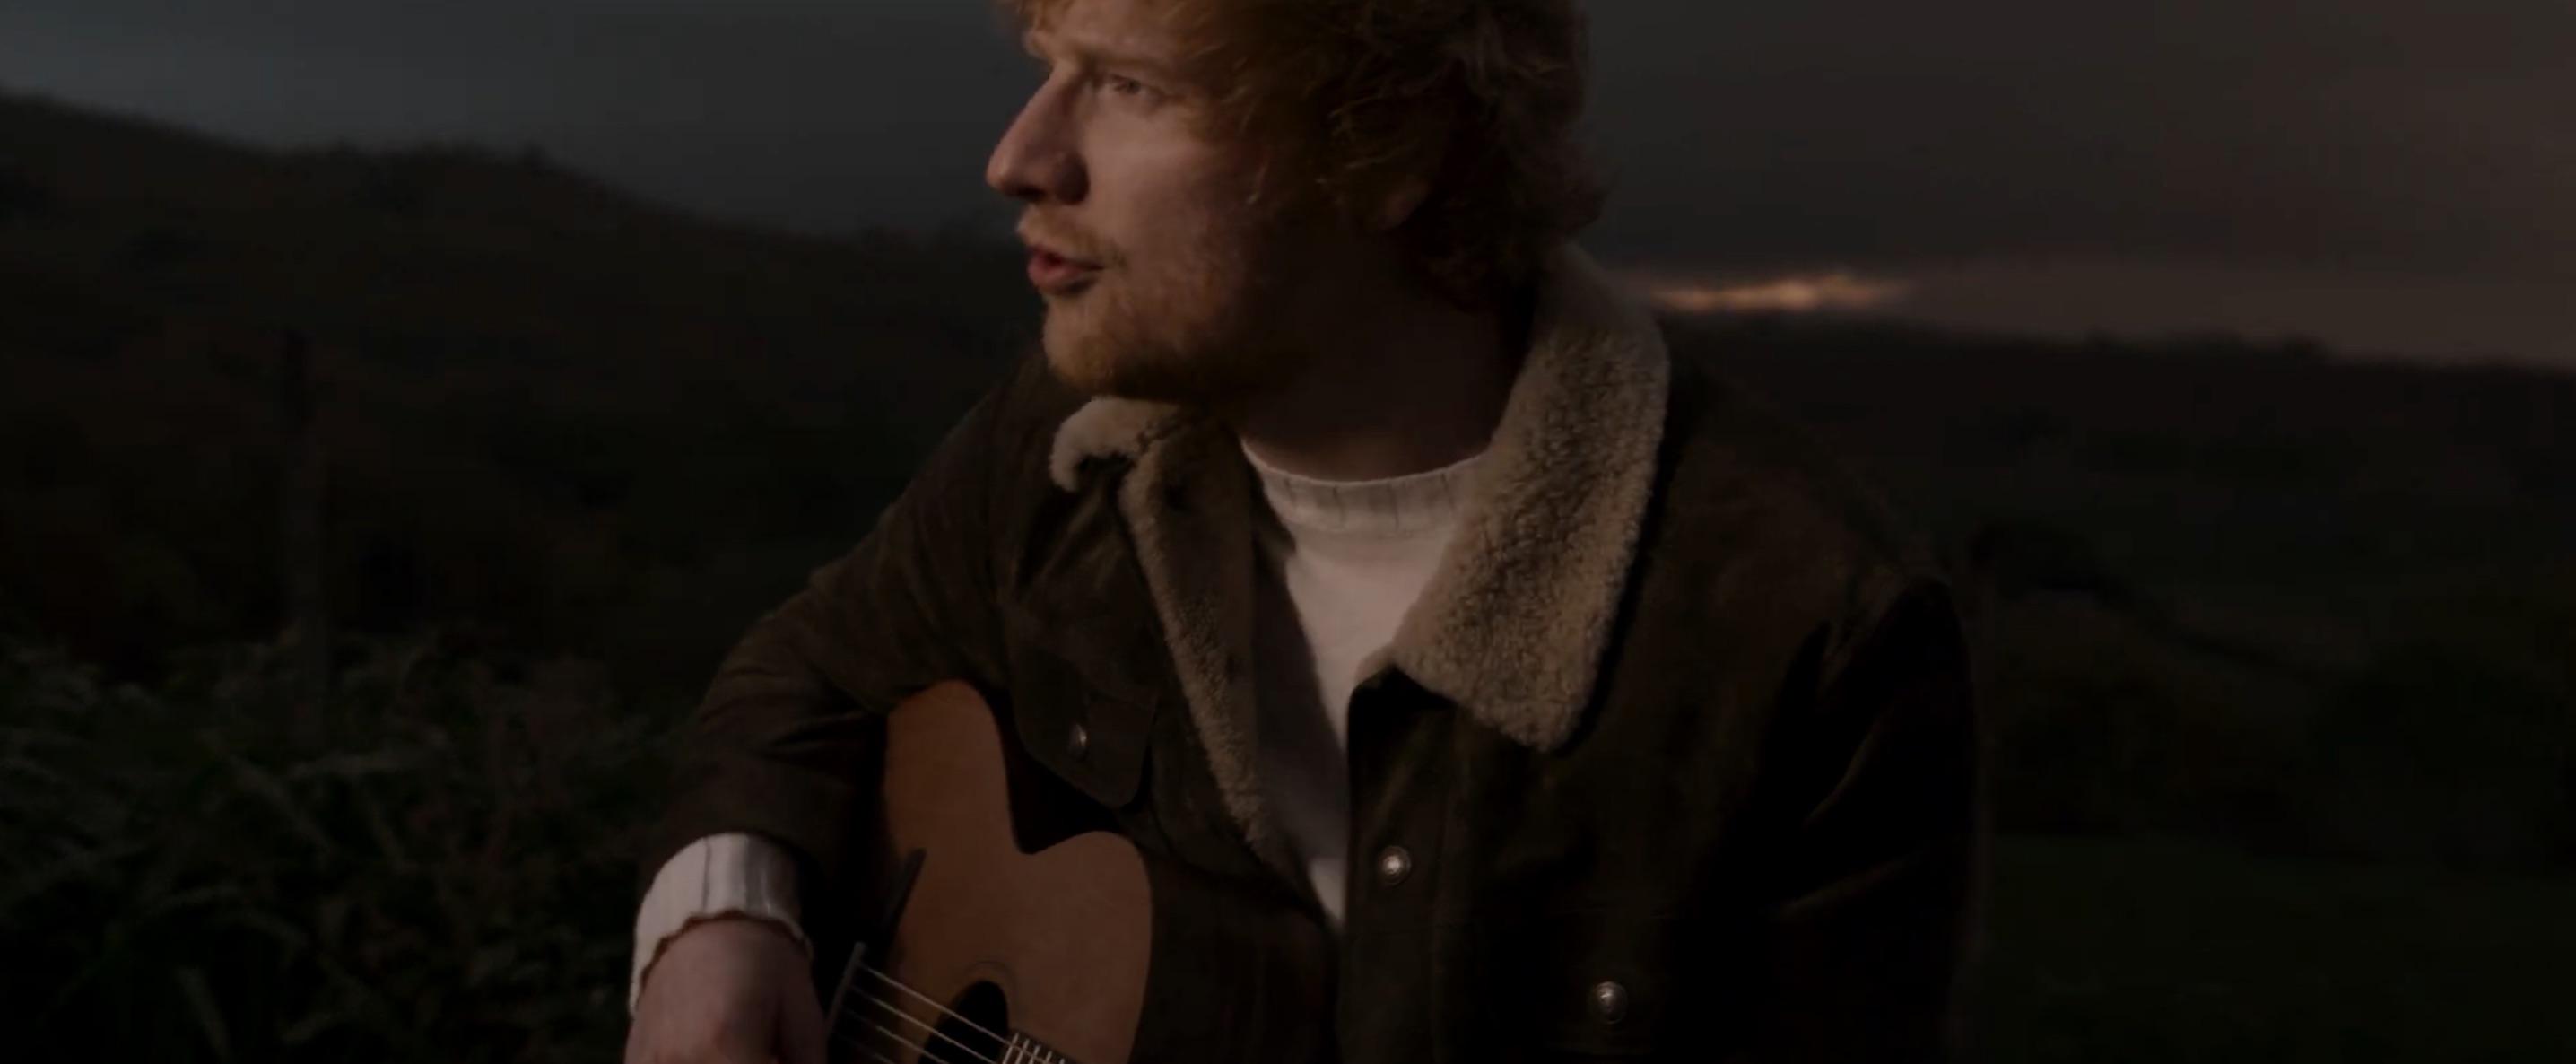 Ed sheeran - Afterglow -